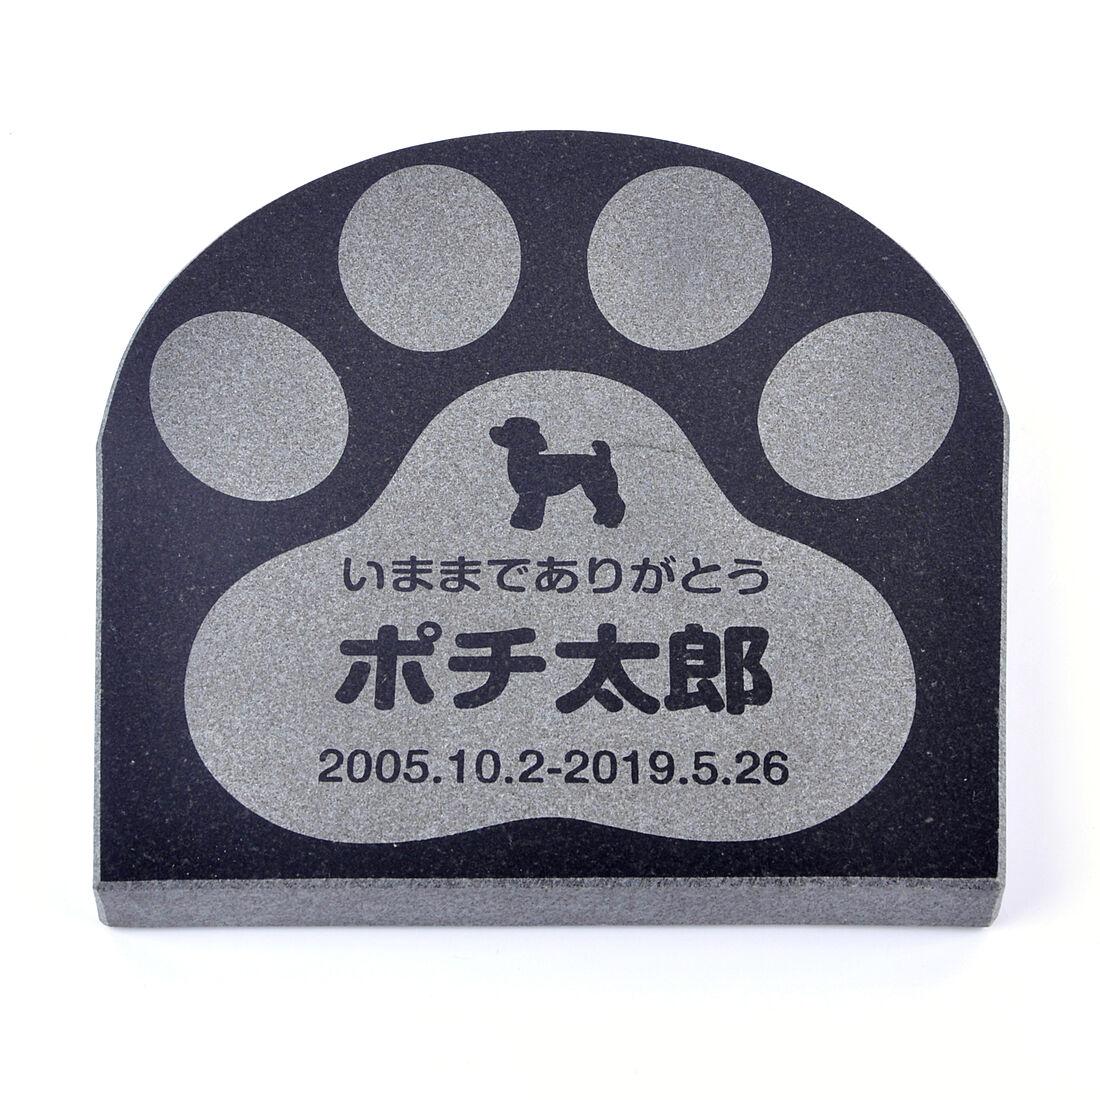 Pet&Love. ペットのお墓 天然石製 シンプル型 手のひら肉球タイプ3 黒  200x200mm (厚さ20mm)  【HLS_DU】【楽ギフ_名入れ】 attr130attr ctgr2ctgr sml3sml+ctgr2ctgr DOG